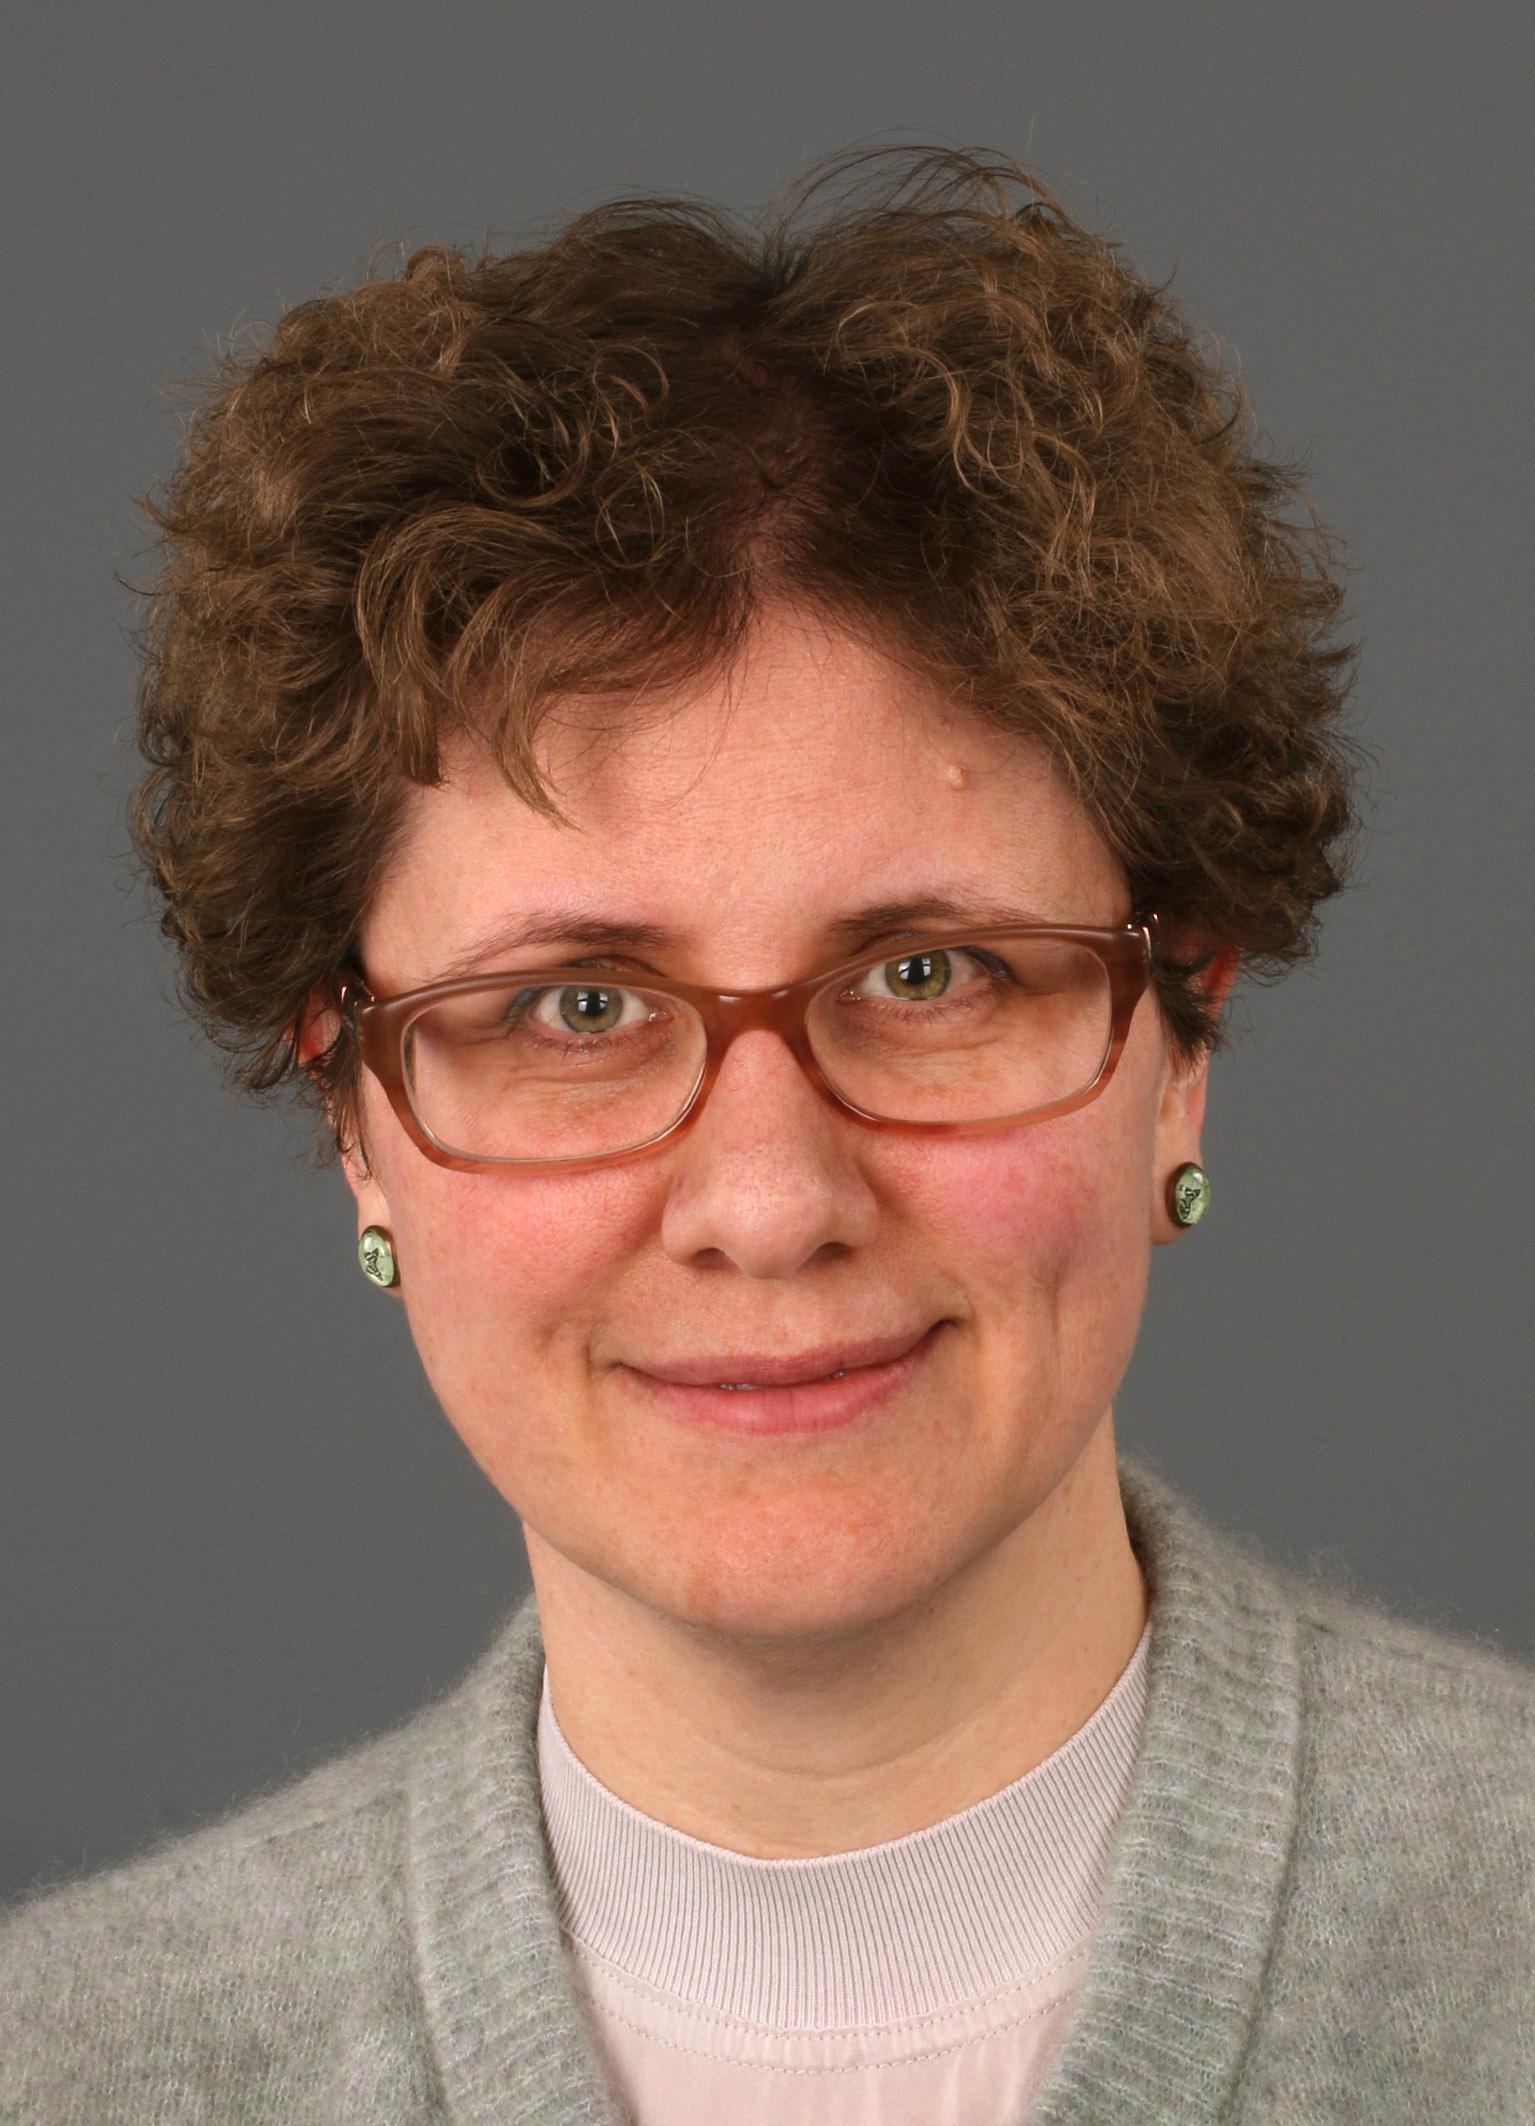 Dr. Maaike Vreeburg